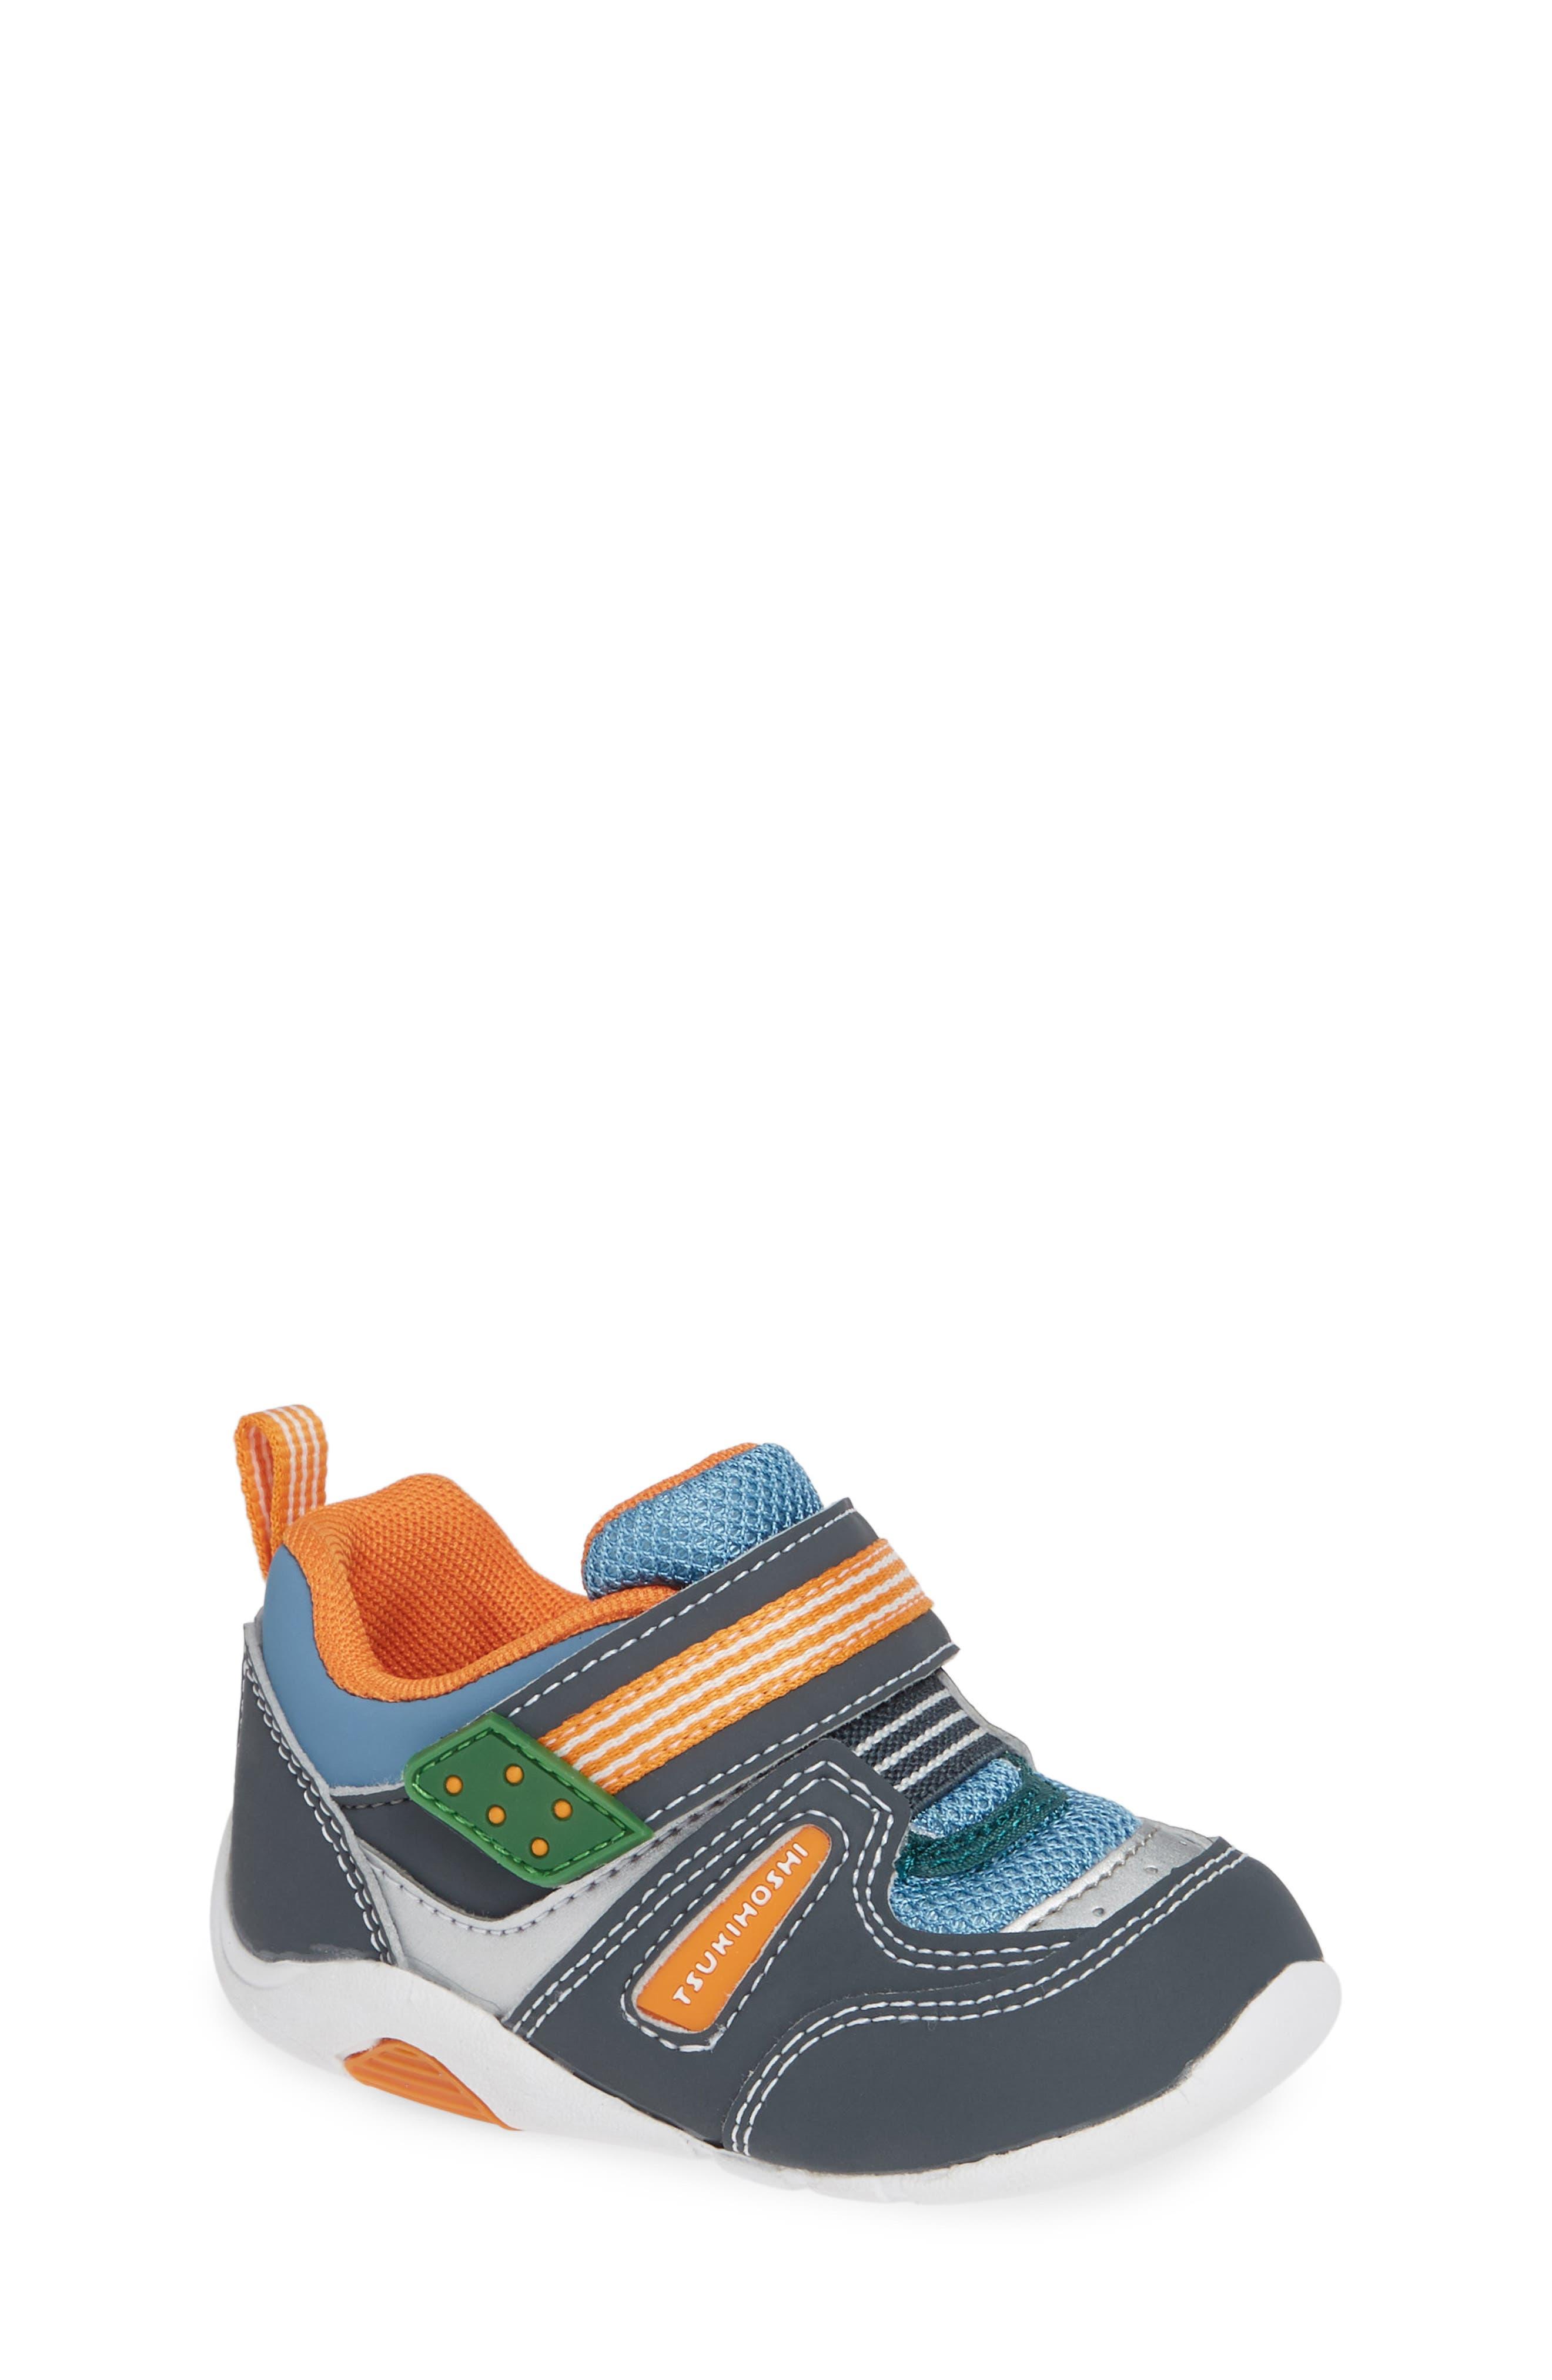 Neko Washable Sneaker,                         Main,                         color, CHARCOAL/ SEA